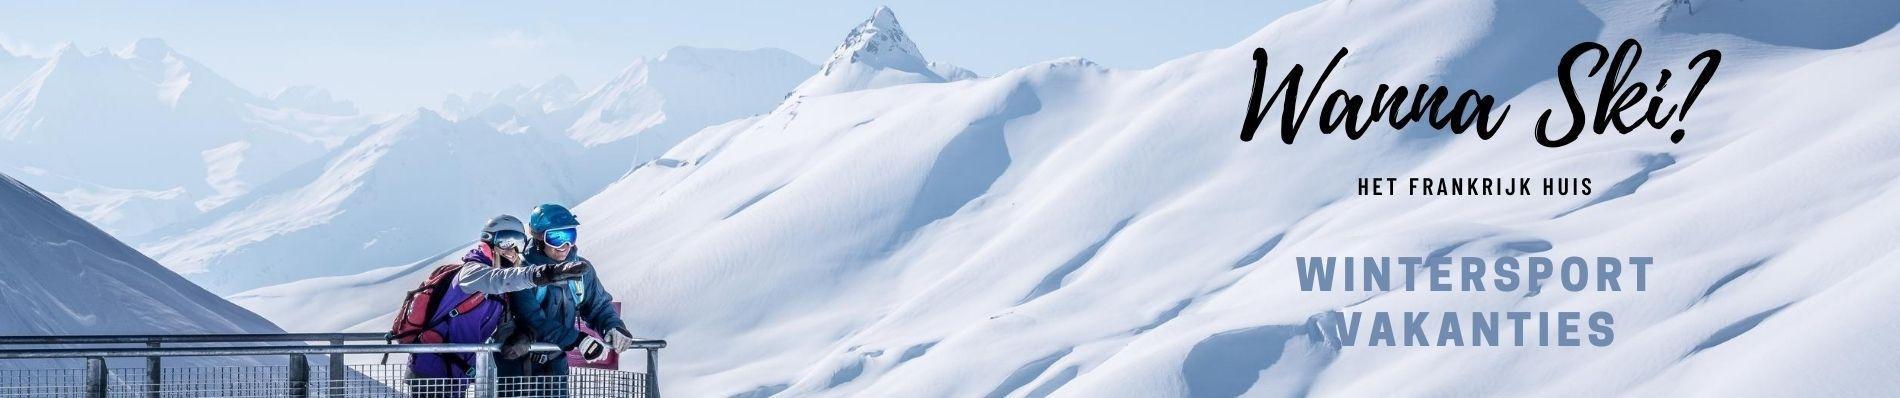 frankrijk wintersport skivakantie ski